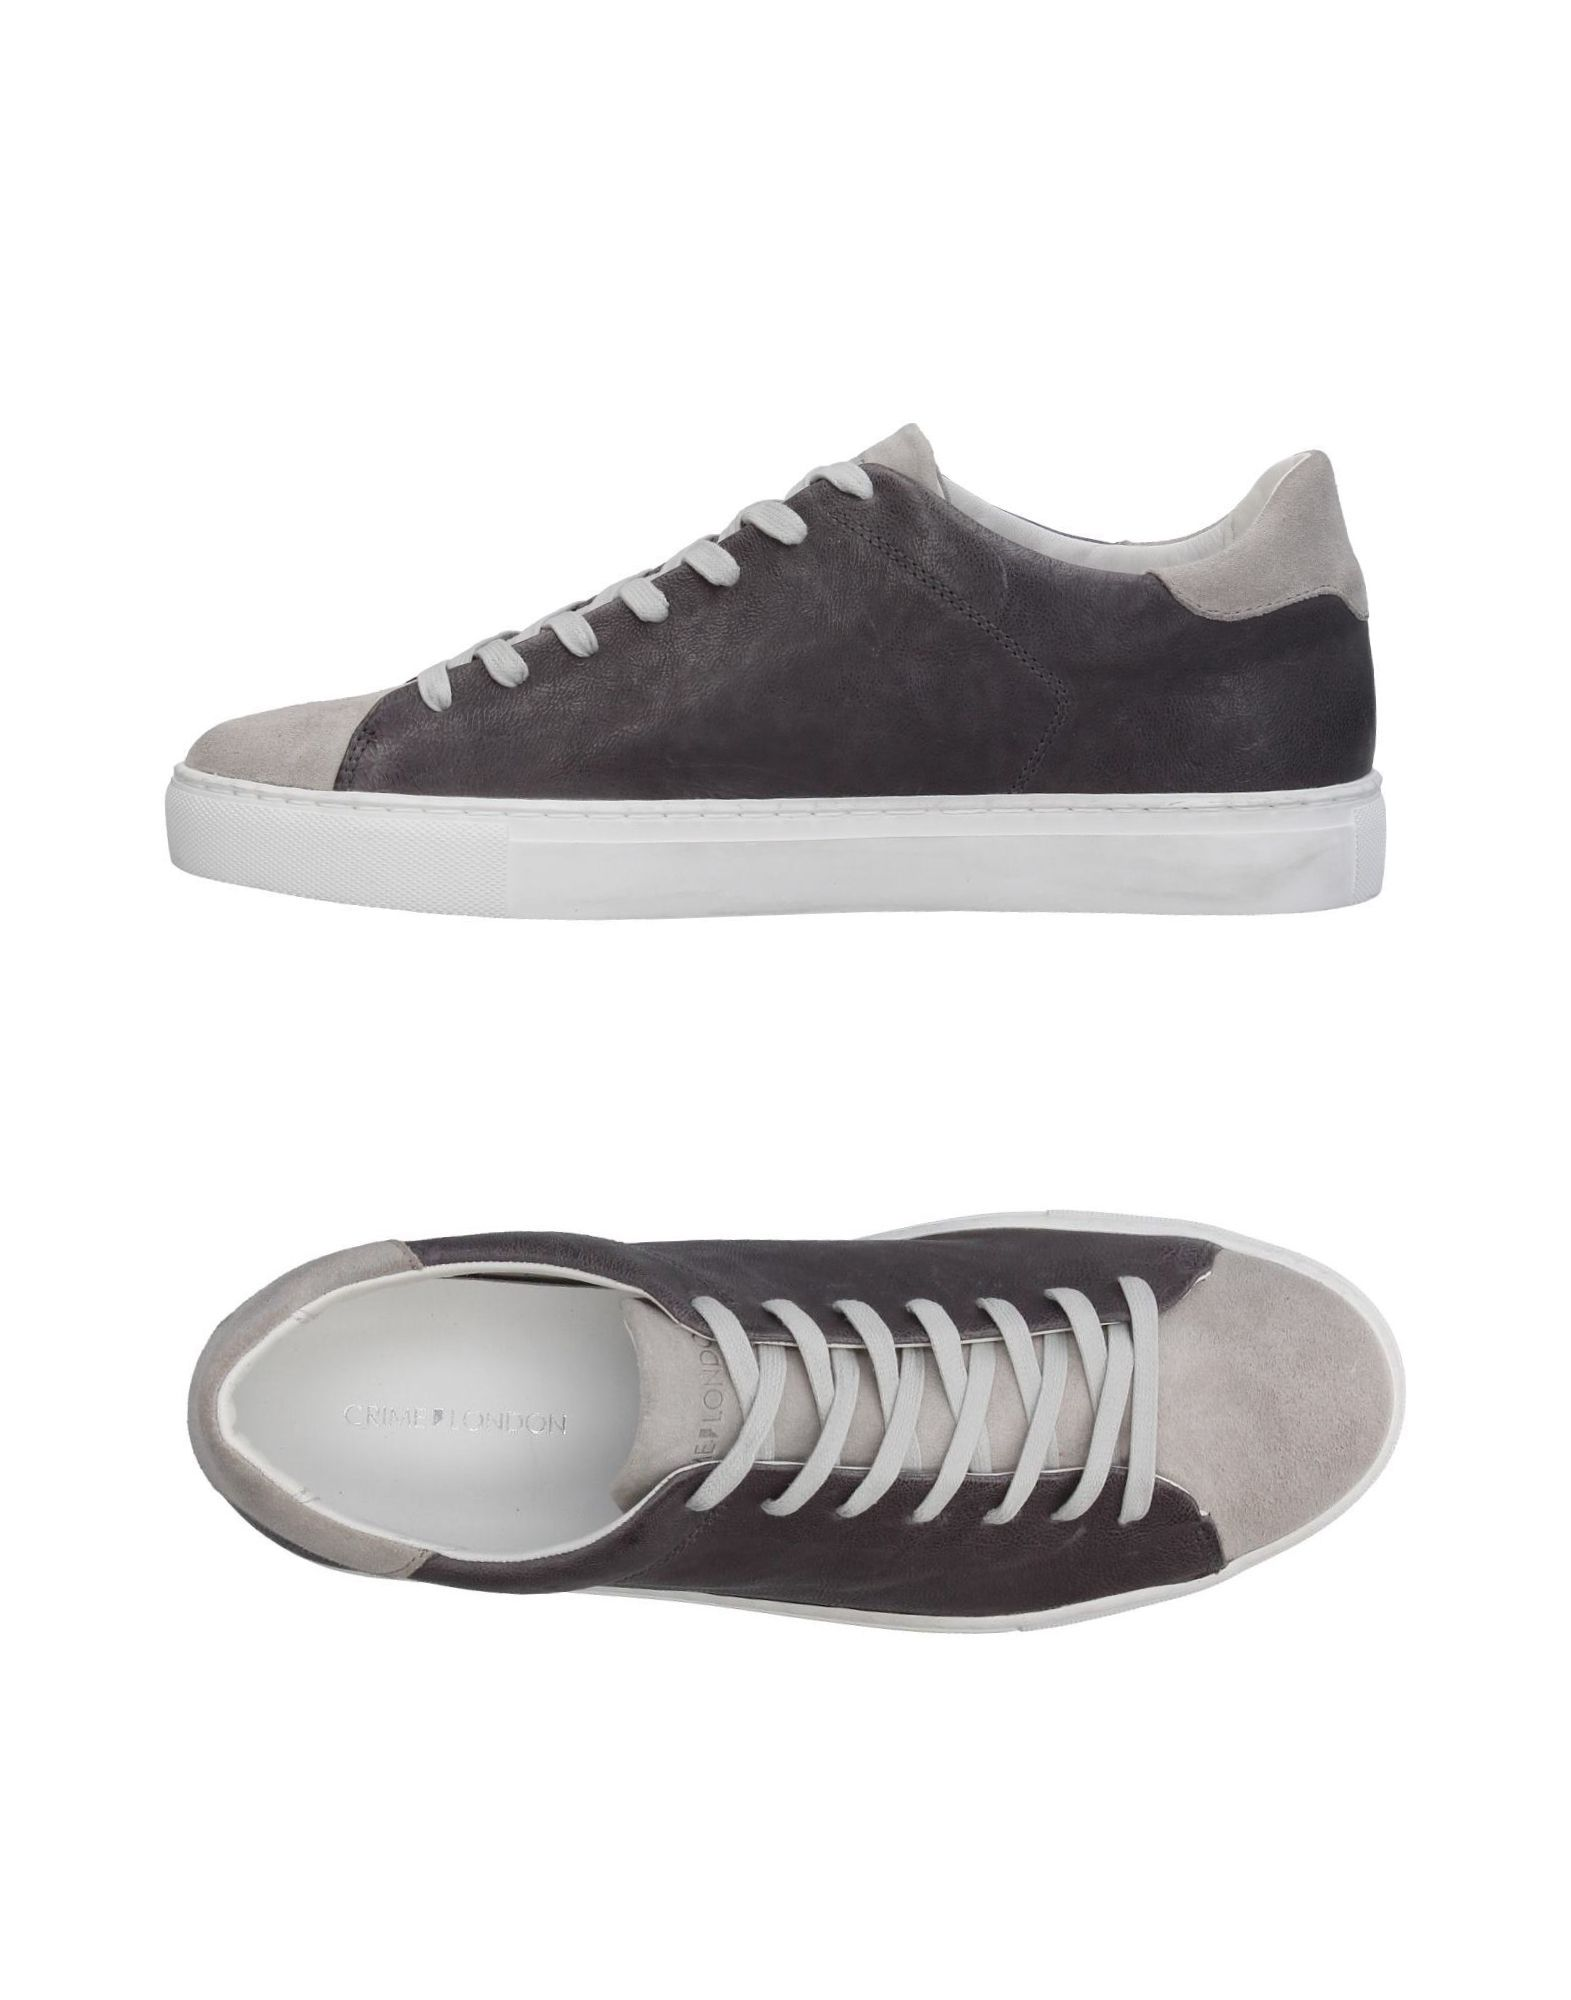 Rabatt echte Schuhe Herren Crime London Sneakers Herren Schuhe  11392191PO daecef